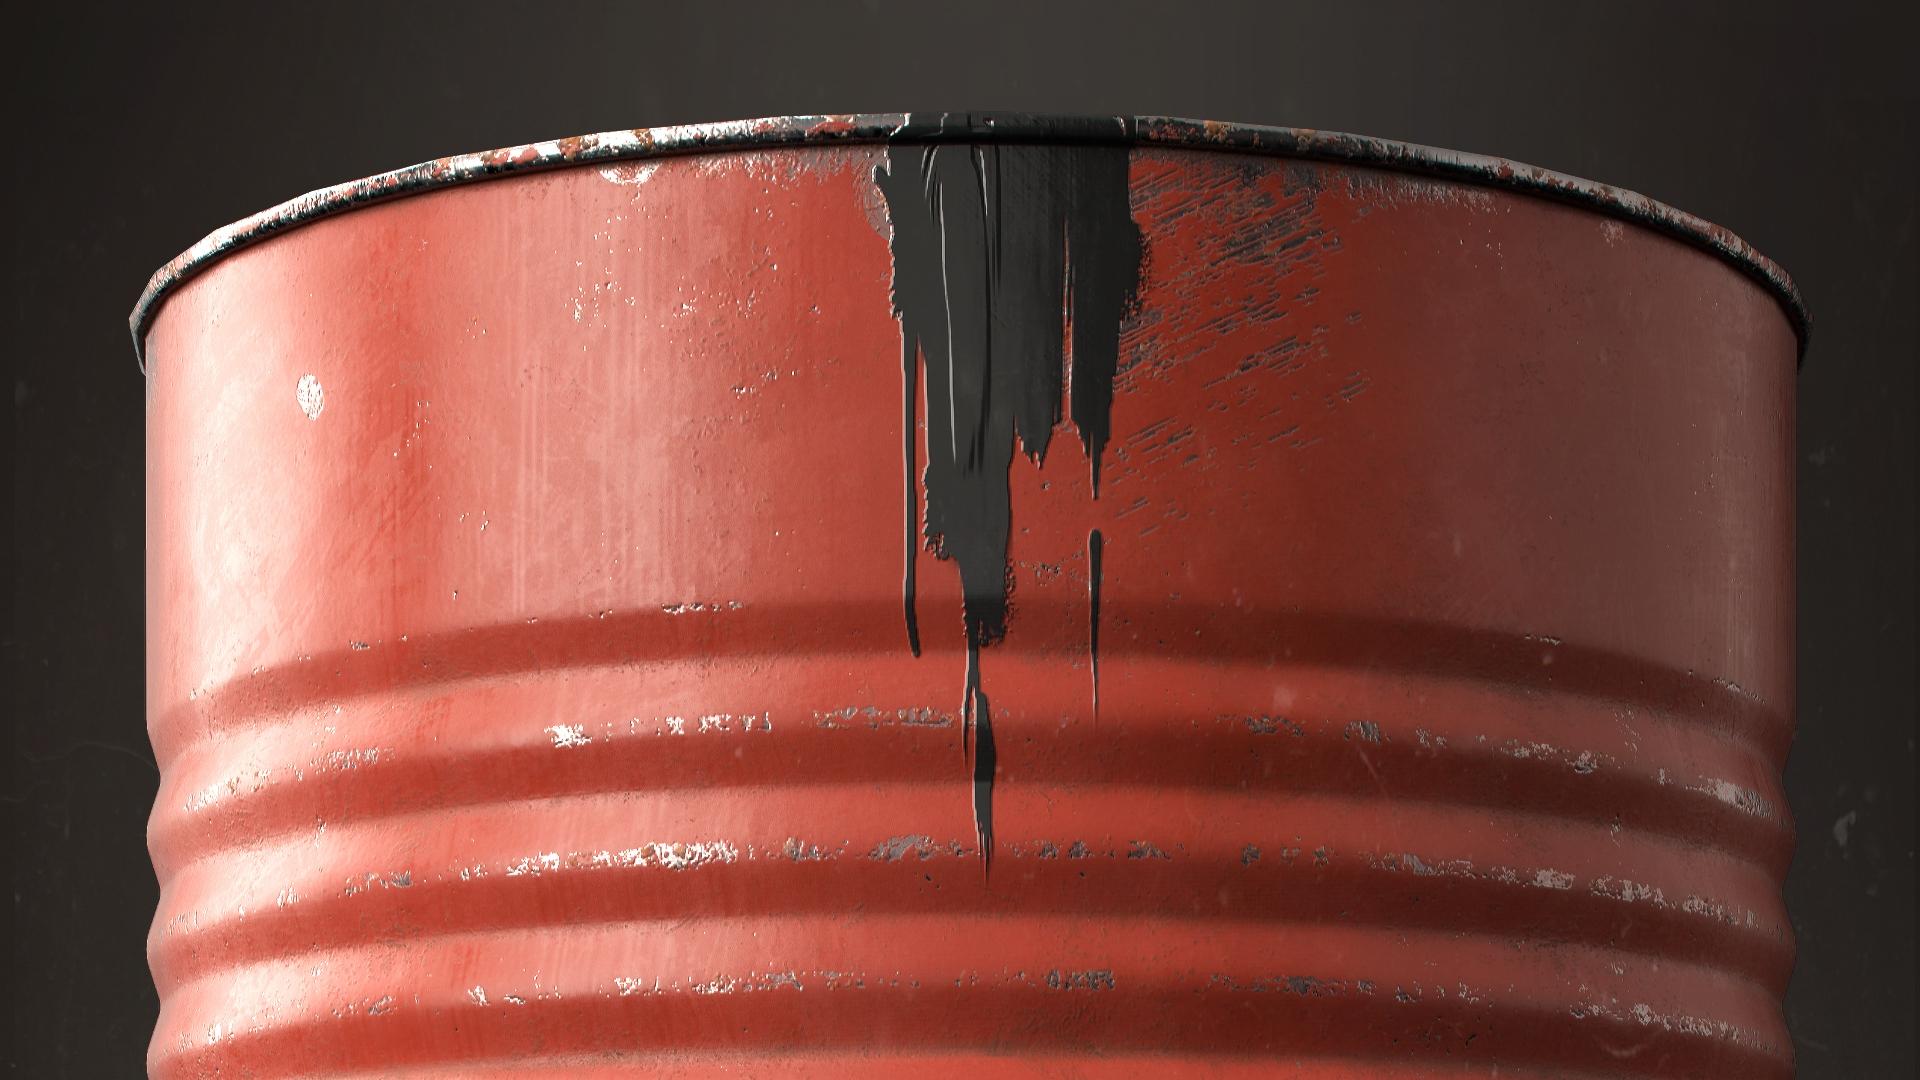 Oil Price, $74 Per Barrel, 4 Years